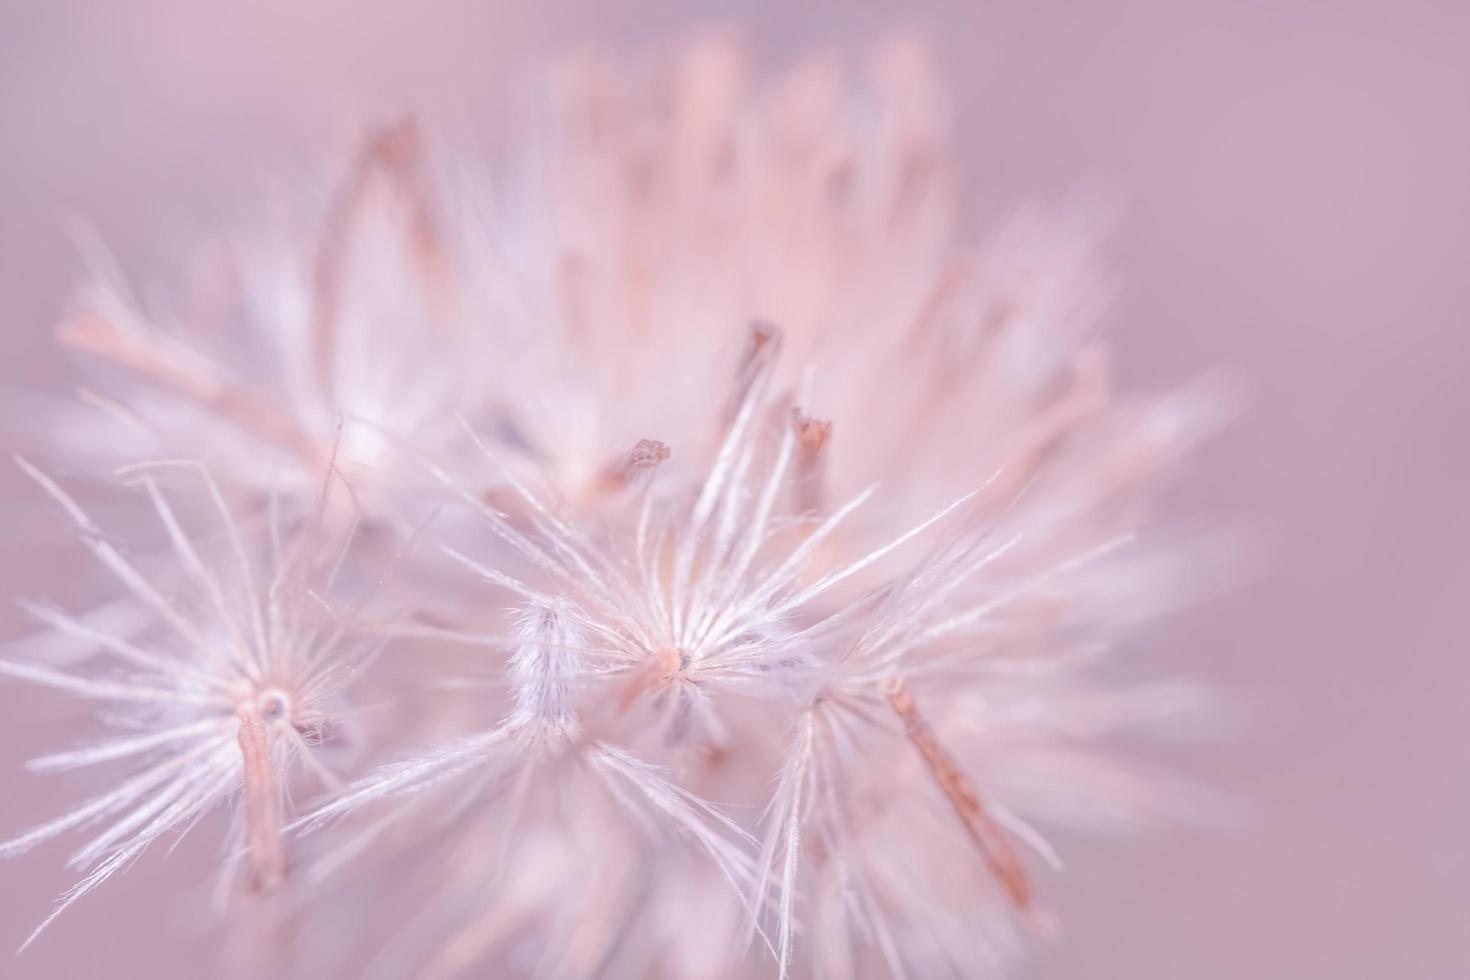 foto de primer plano de flores silvestres